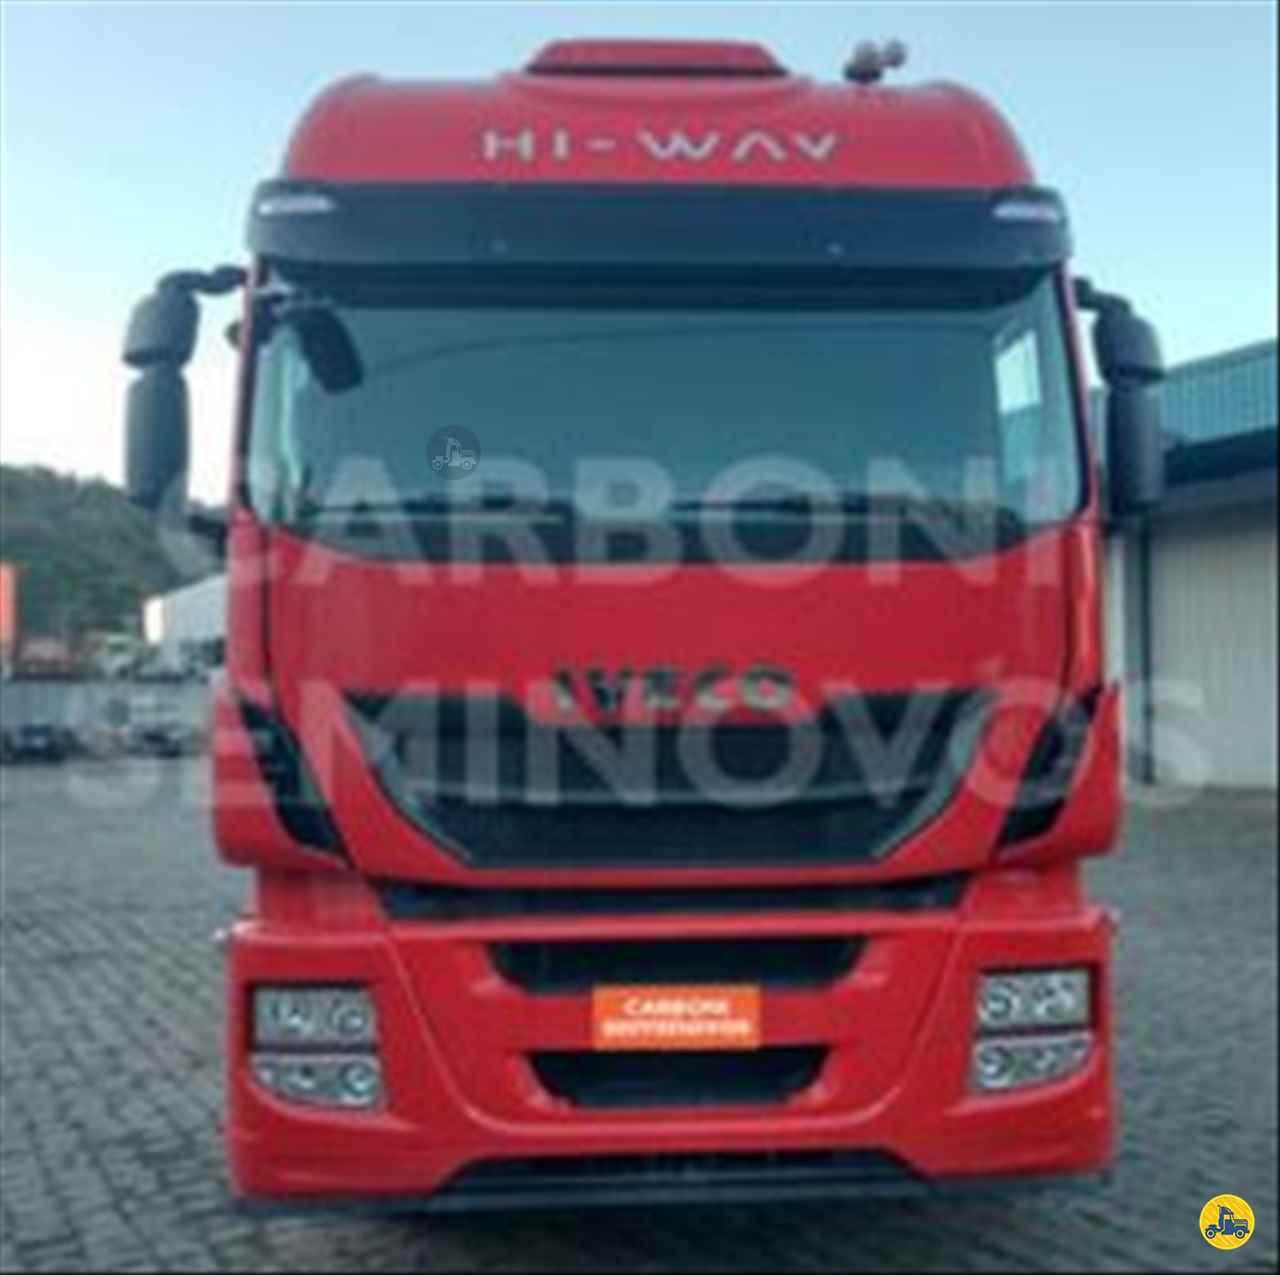 STRALIS 440 de Carboni Iveco - VIDEIRA/SC